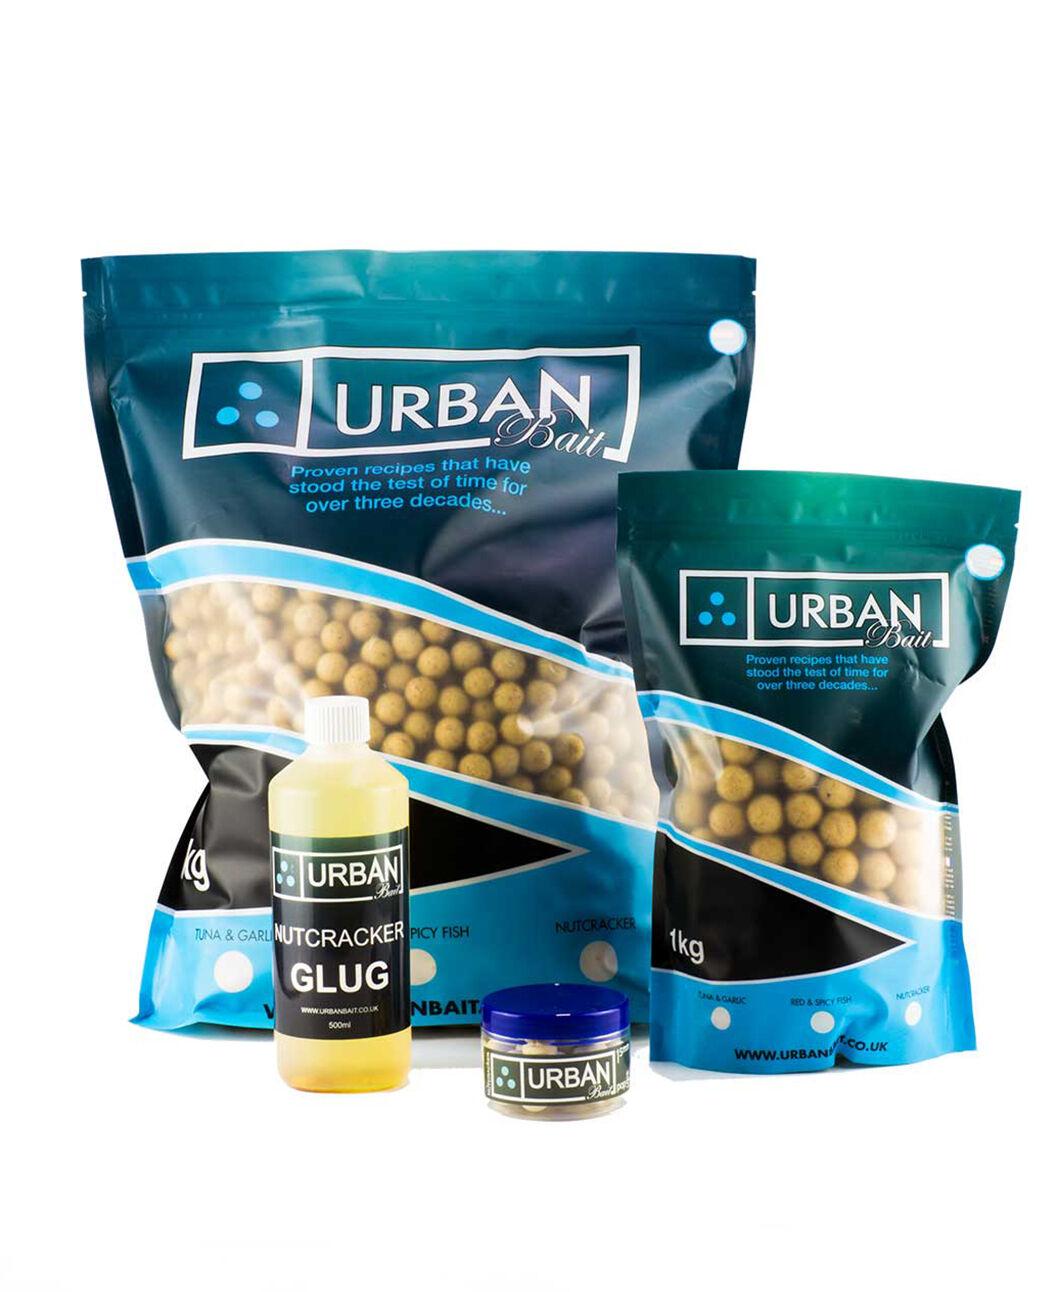 Urban Baits Nutcracker Shelflife 1kg or 5kg FREE POST